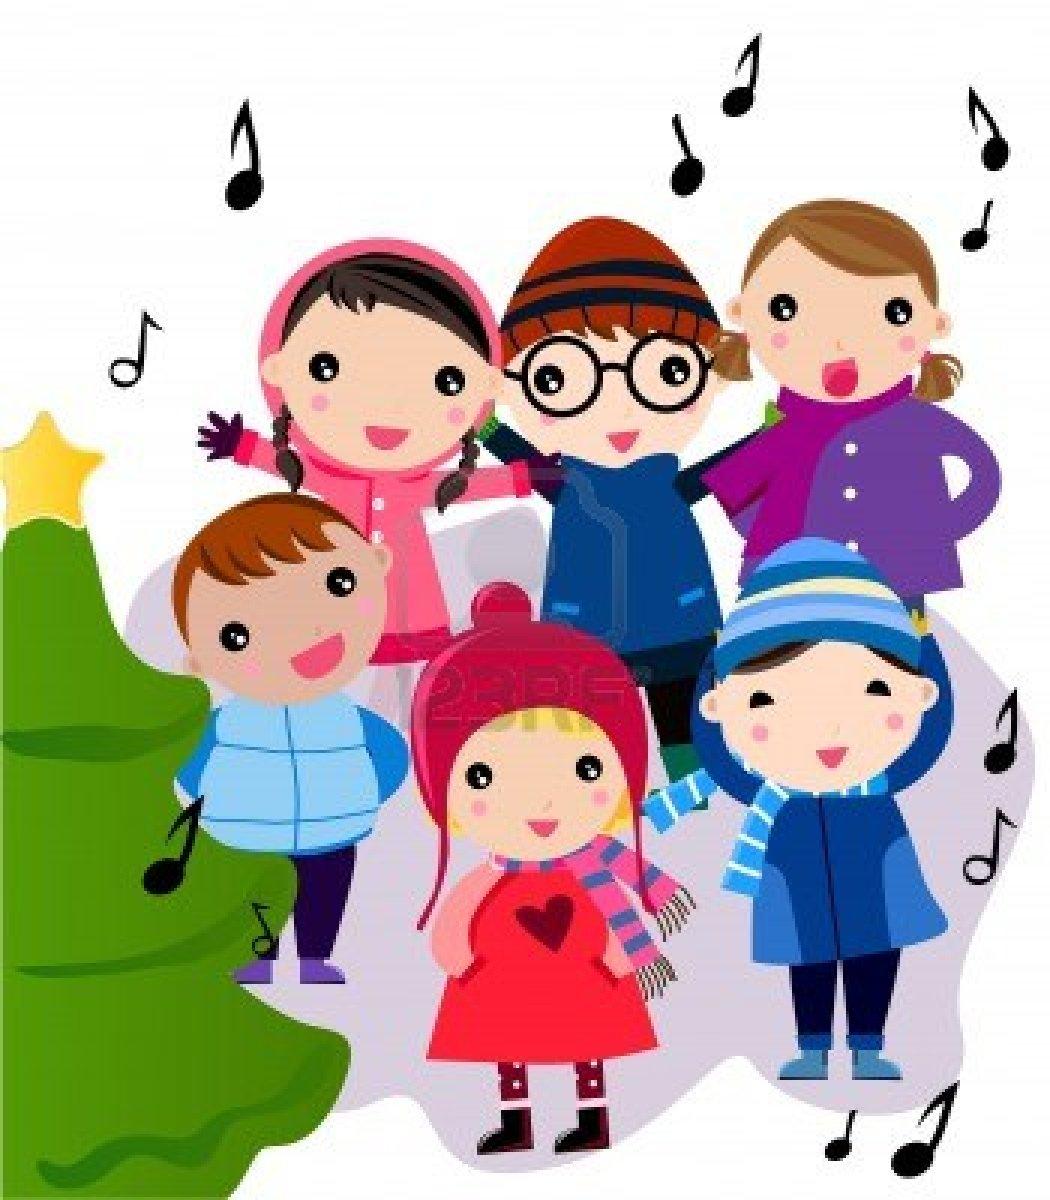 Christmas Carols Clipart.Christmas Carols Clip Art N7 Free Image